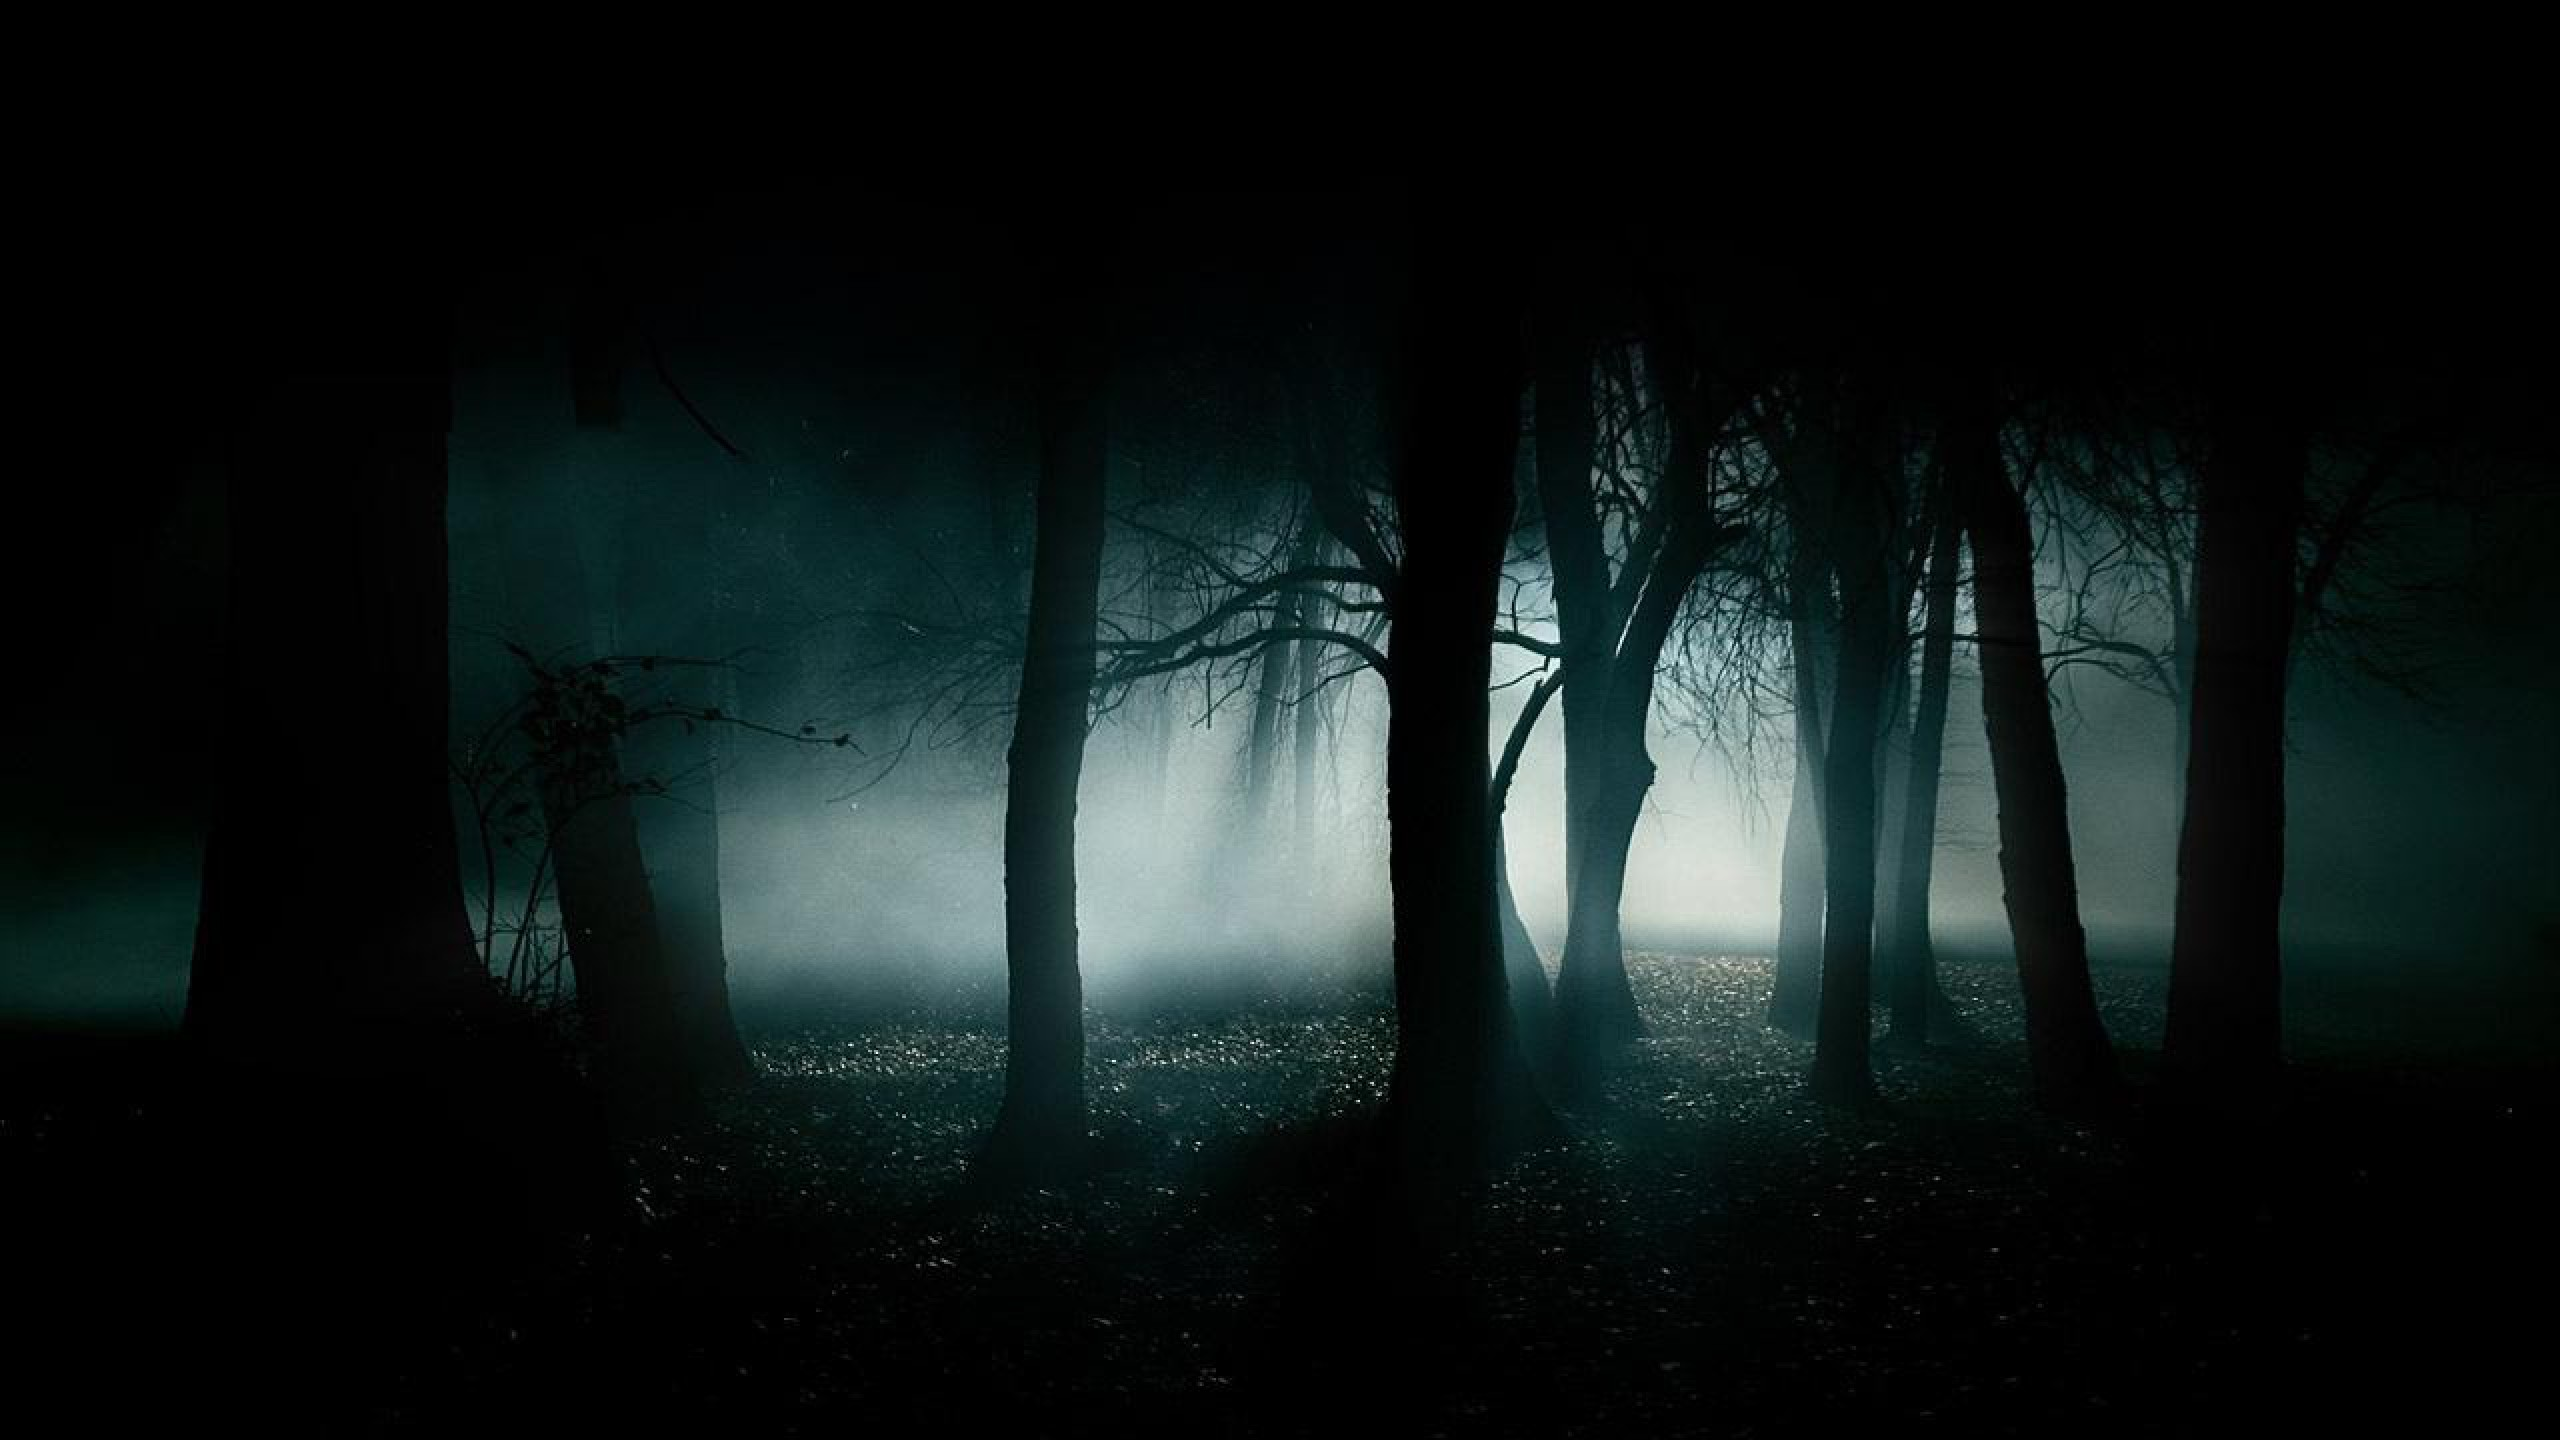 Hd wallpaper darkness - Forest Hd Dark Wallpaper